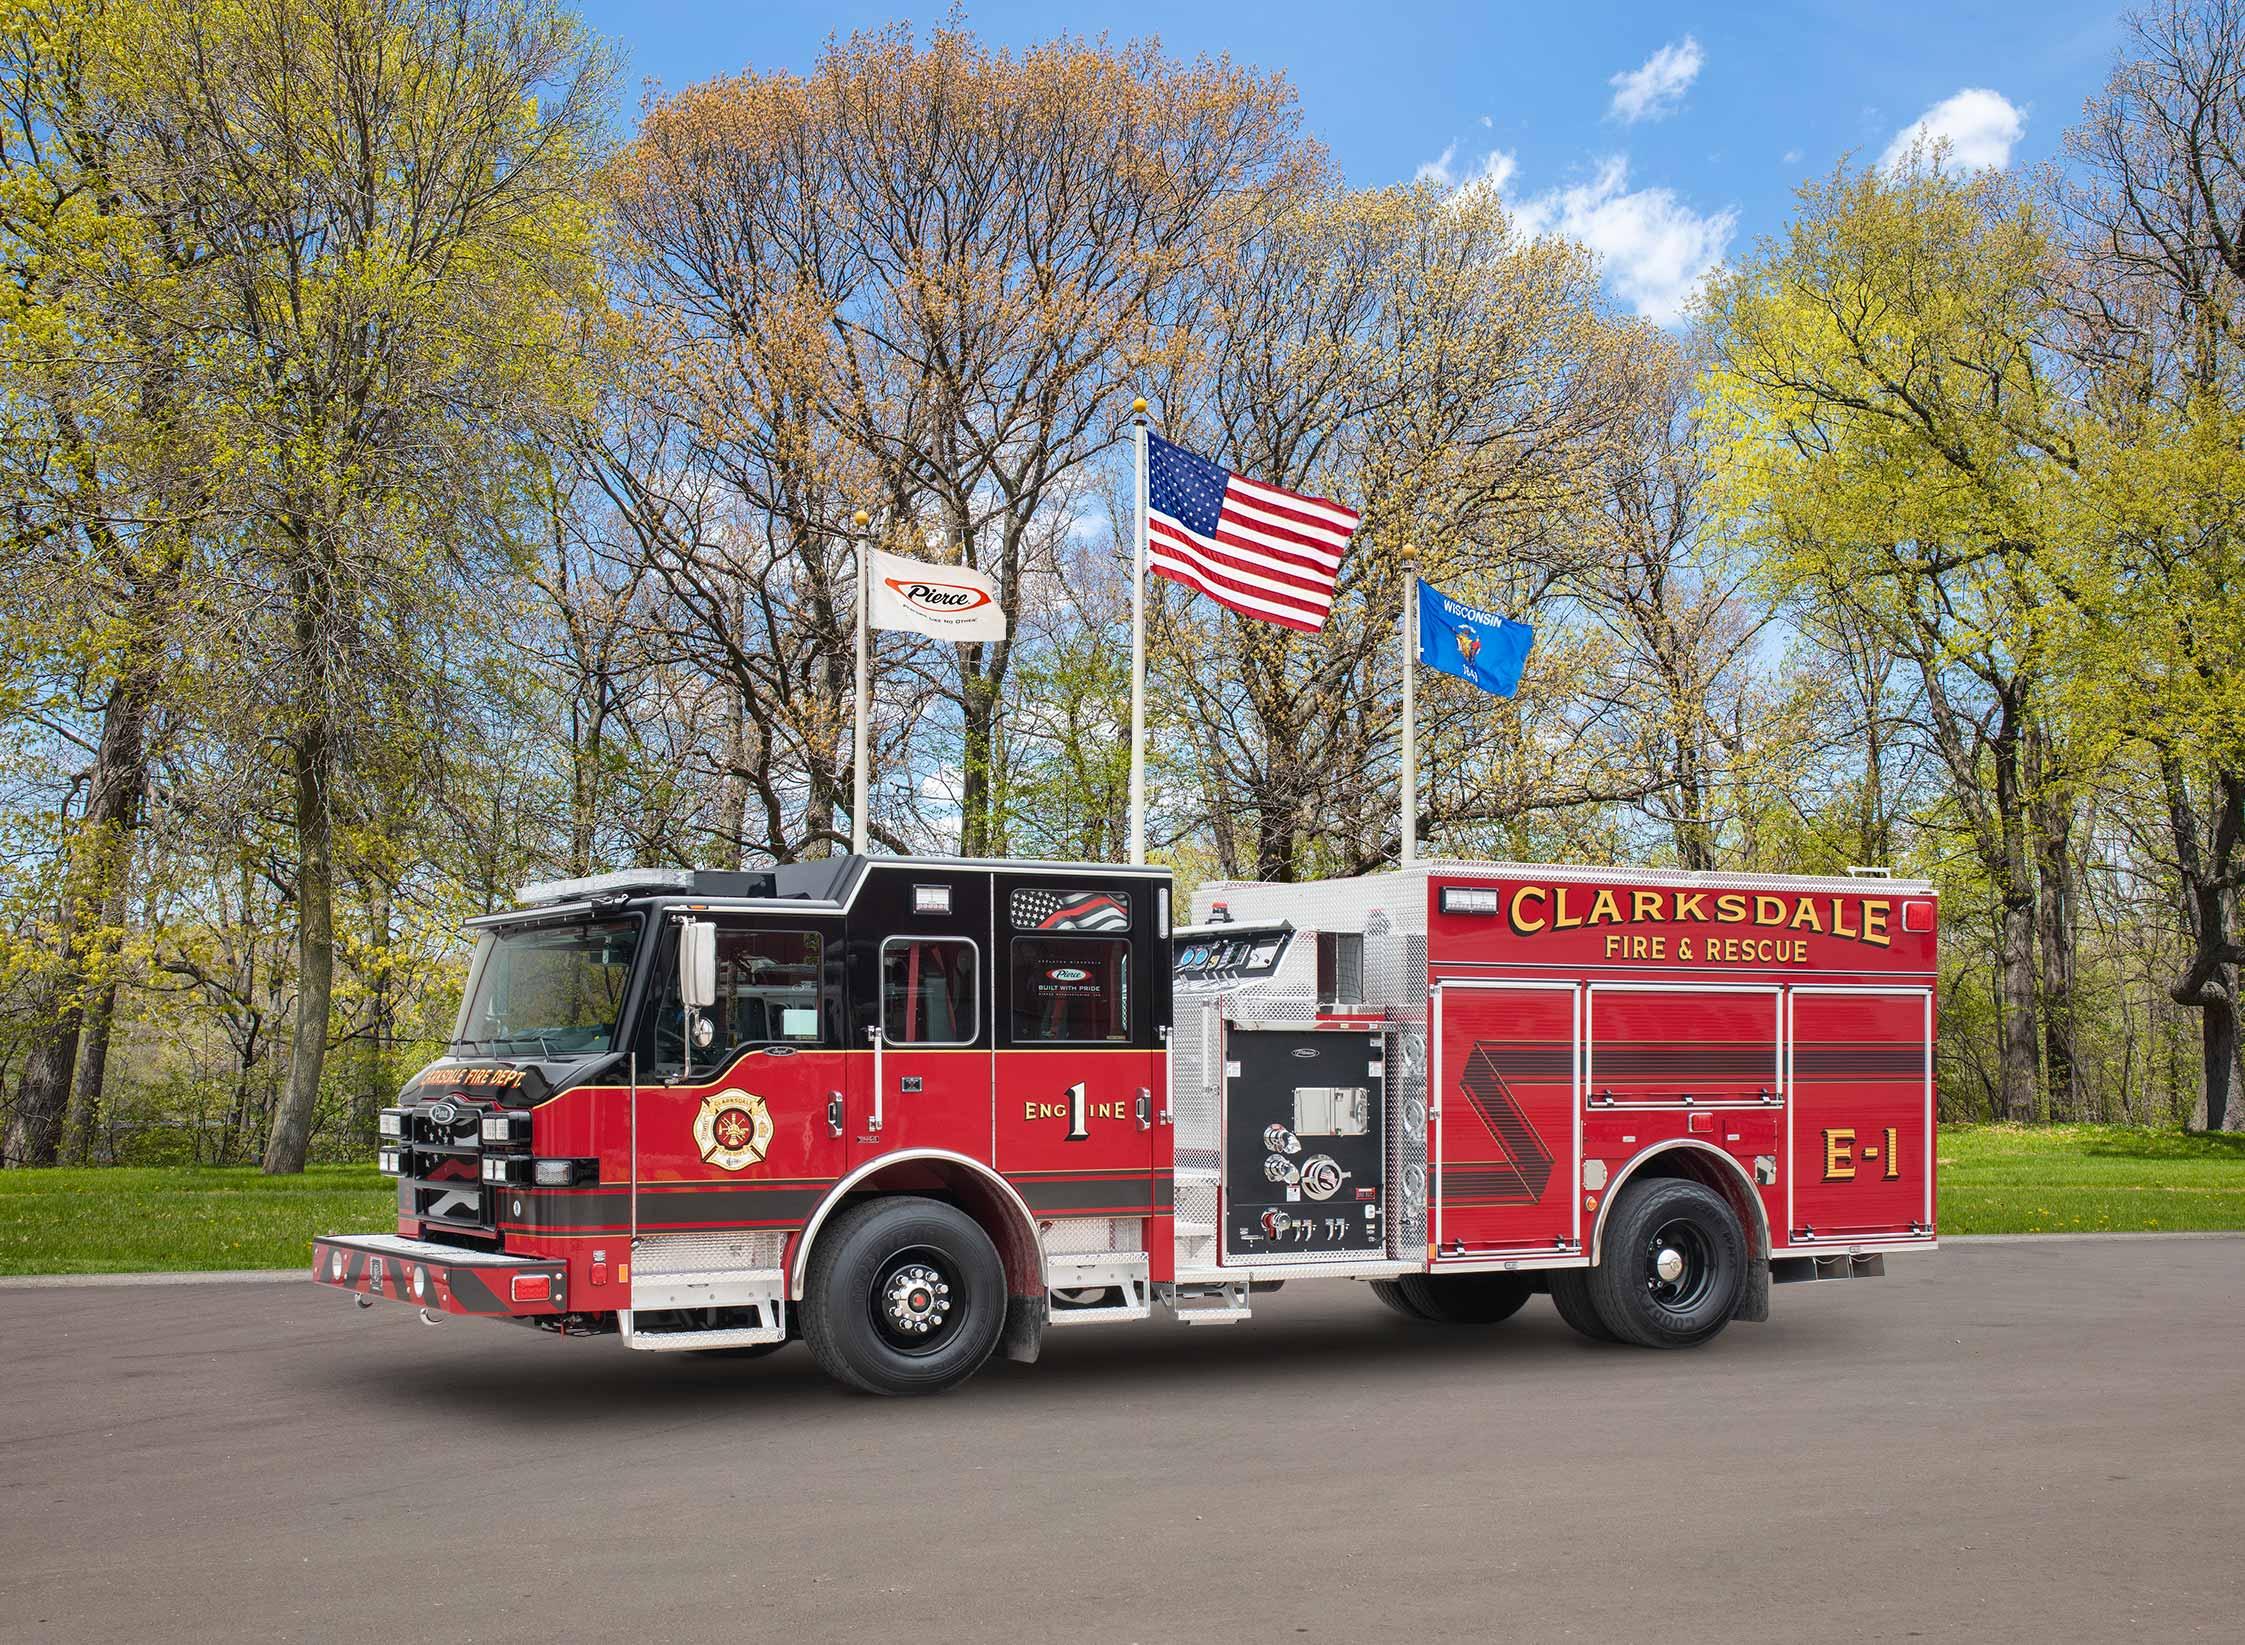 Clarksdale Fire & Rescue - Pumper